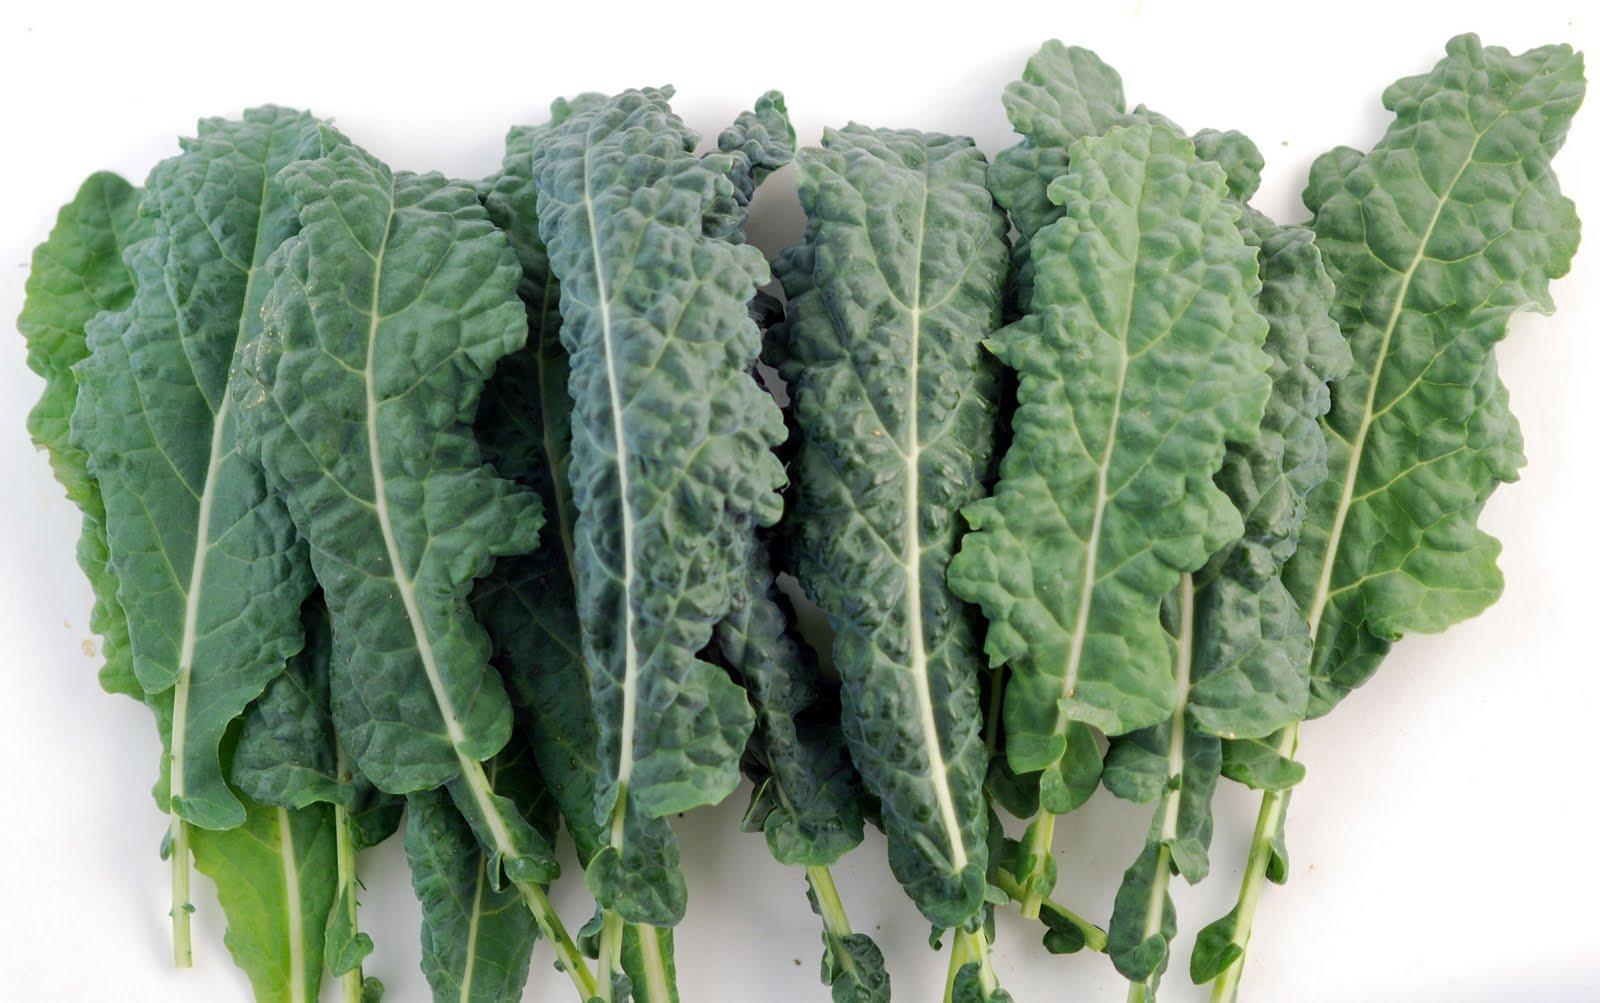 http://3.bp.blogspot.com/_QWZGKyz1Cak/S7yQmXA746I/AAAAAAAABIQ/WSPd4A8lmdw/s1600/Kale-Lacinato-Cut.jpg